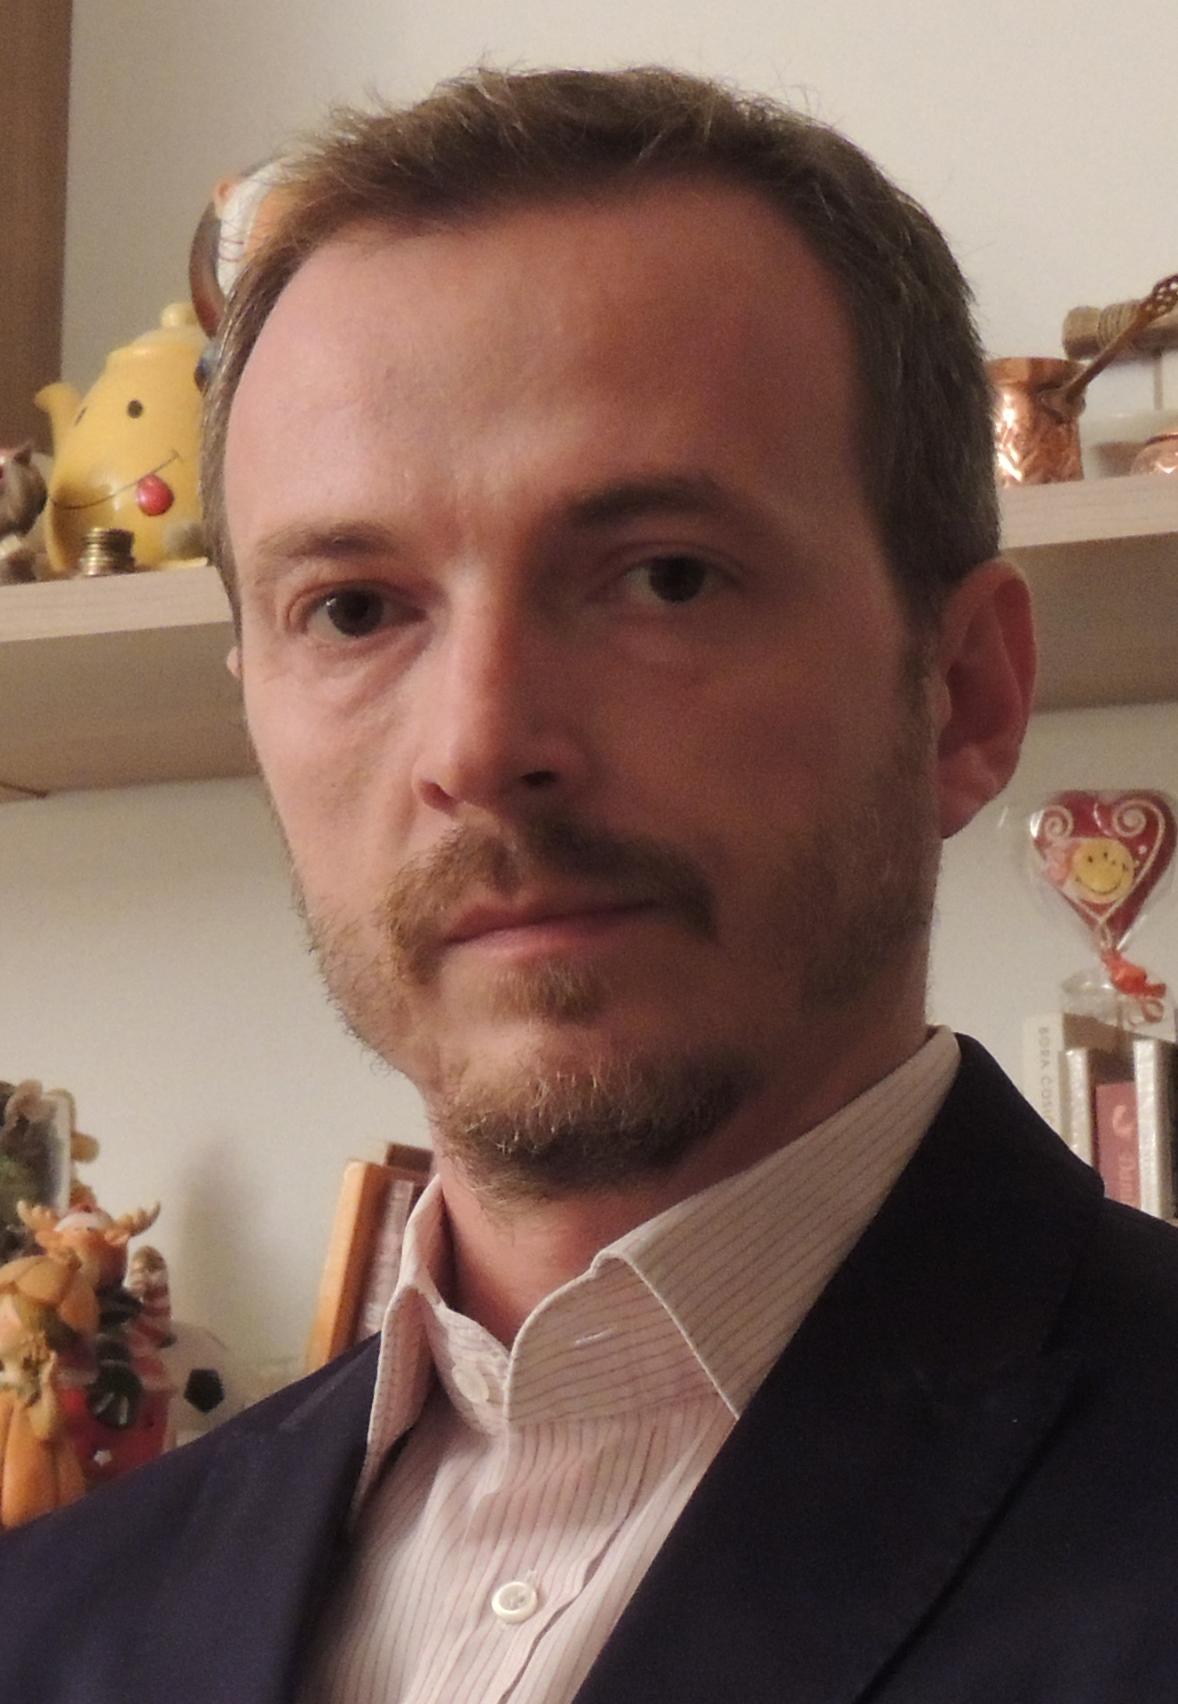 Dr Darko Perković